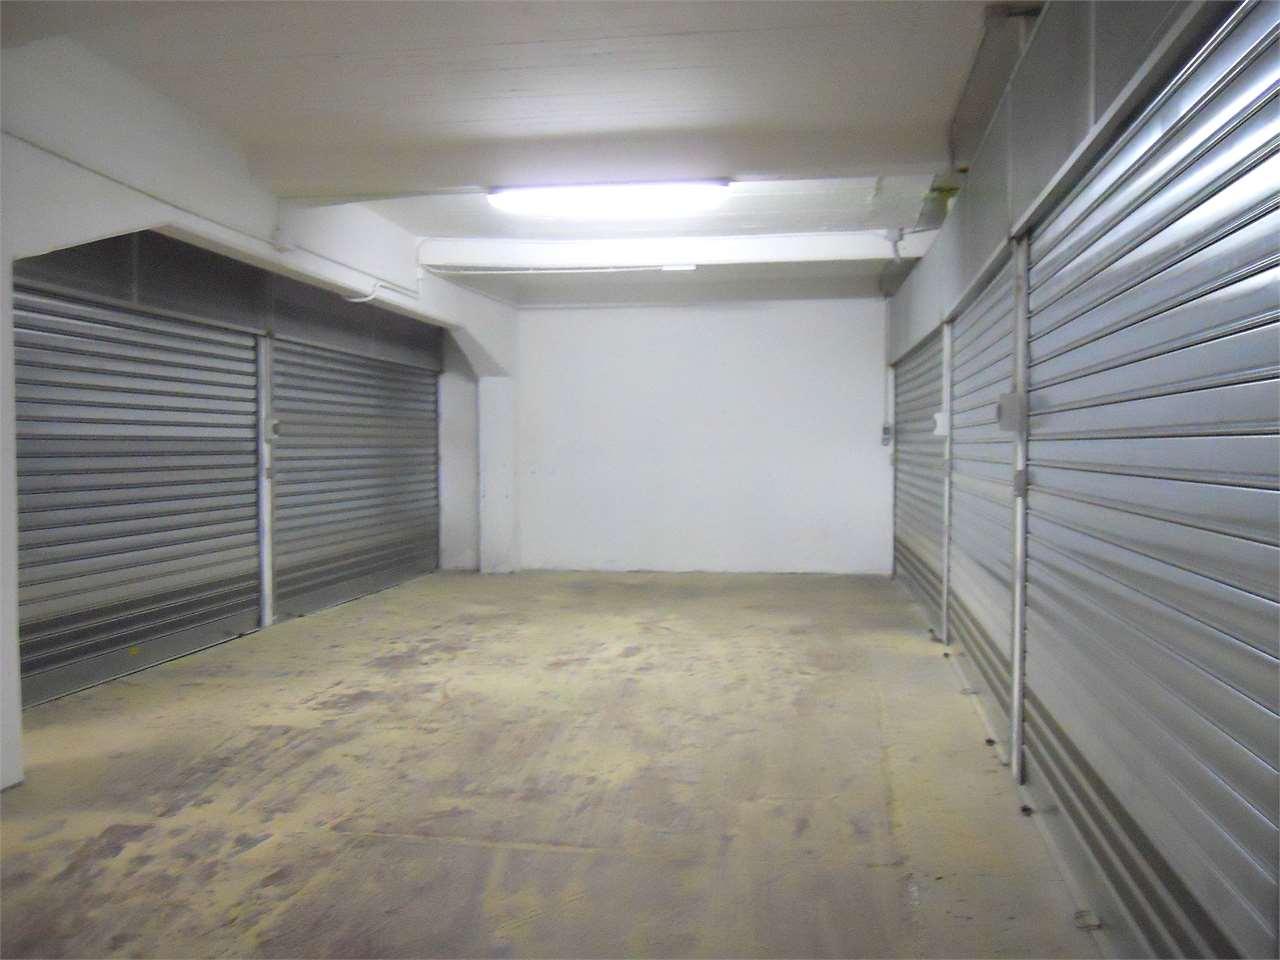 Vendita Garage Garage/Posto Auto Asti Viale Pilone 78 46824